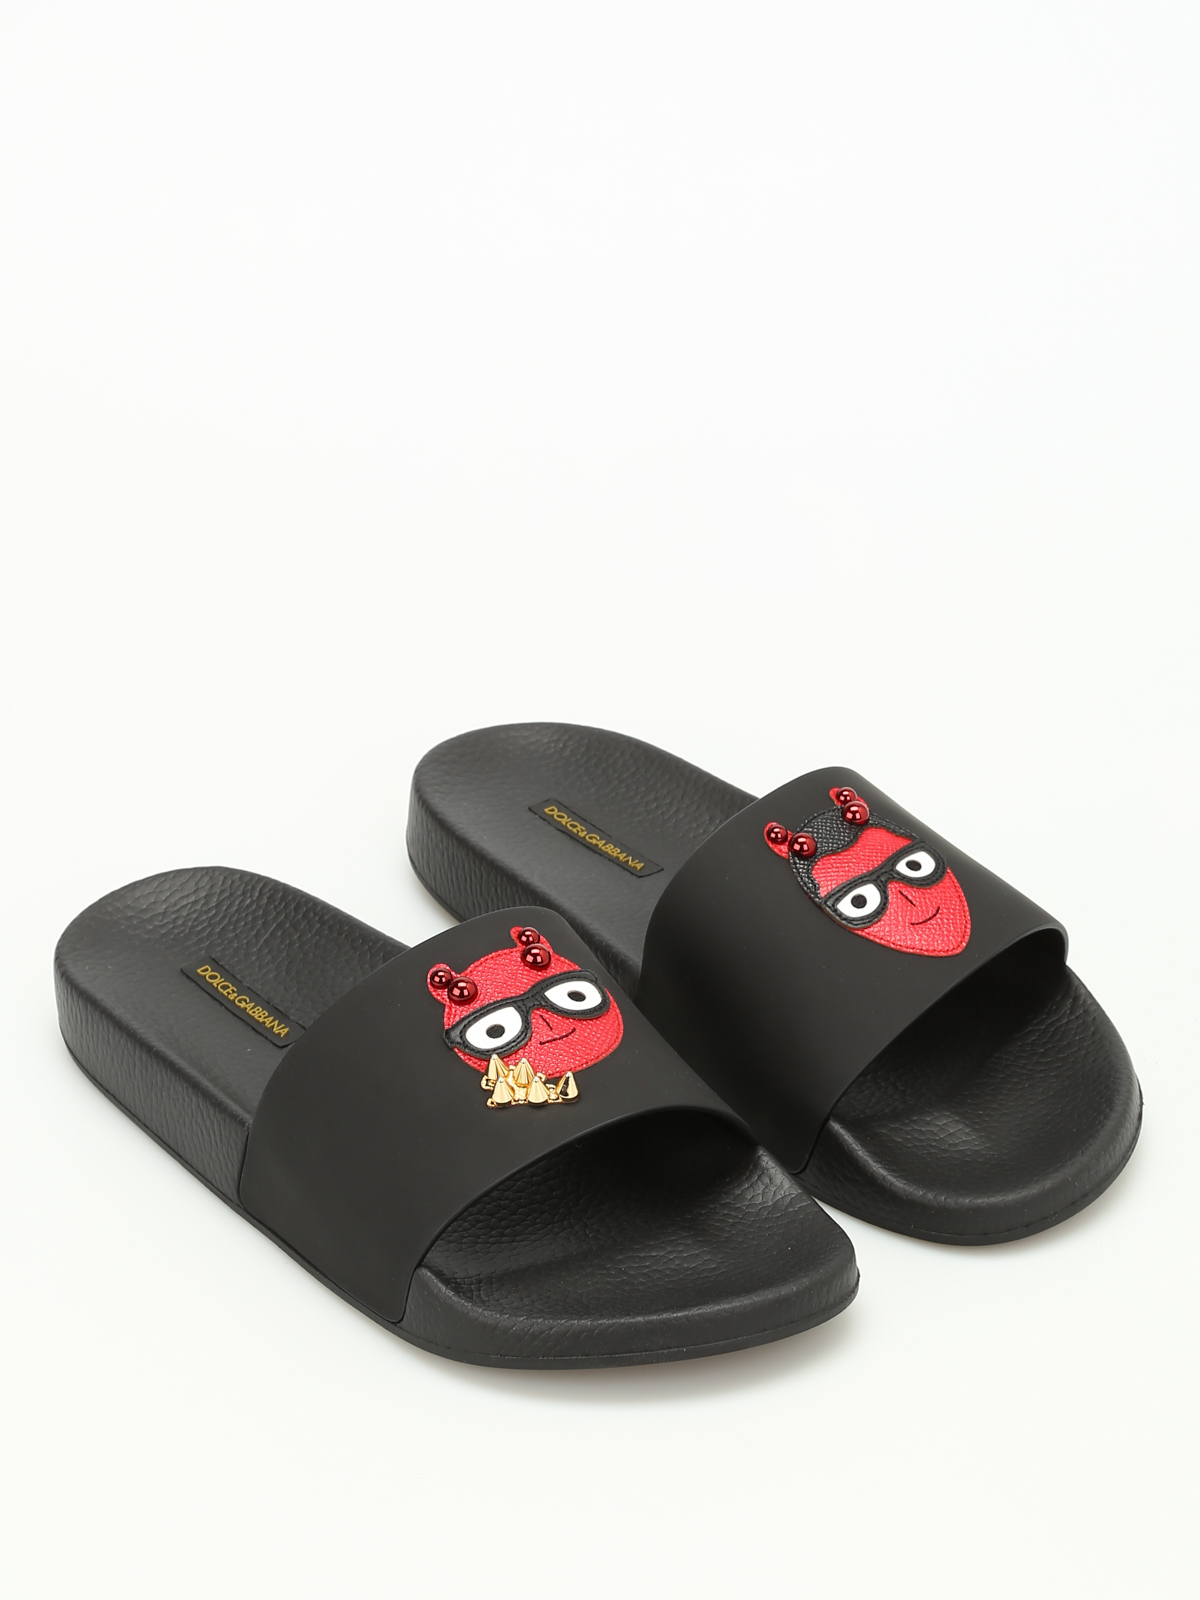 5ff15f8ee617 Dolce   Gabbana - Designer patch slides - sandals - CS1489 AH126 8B956